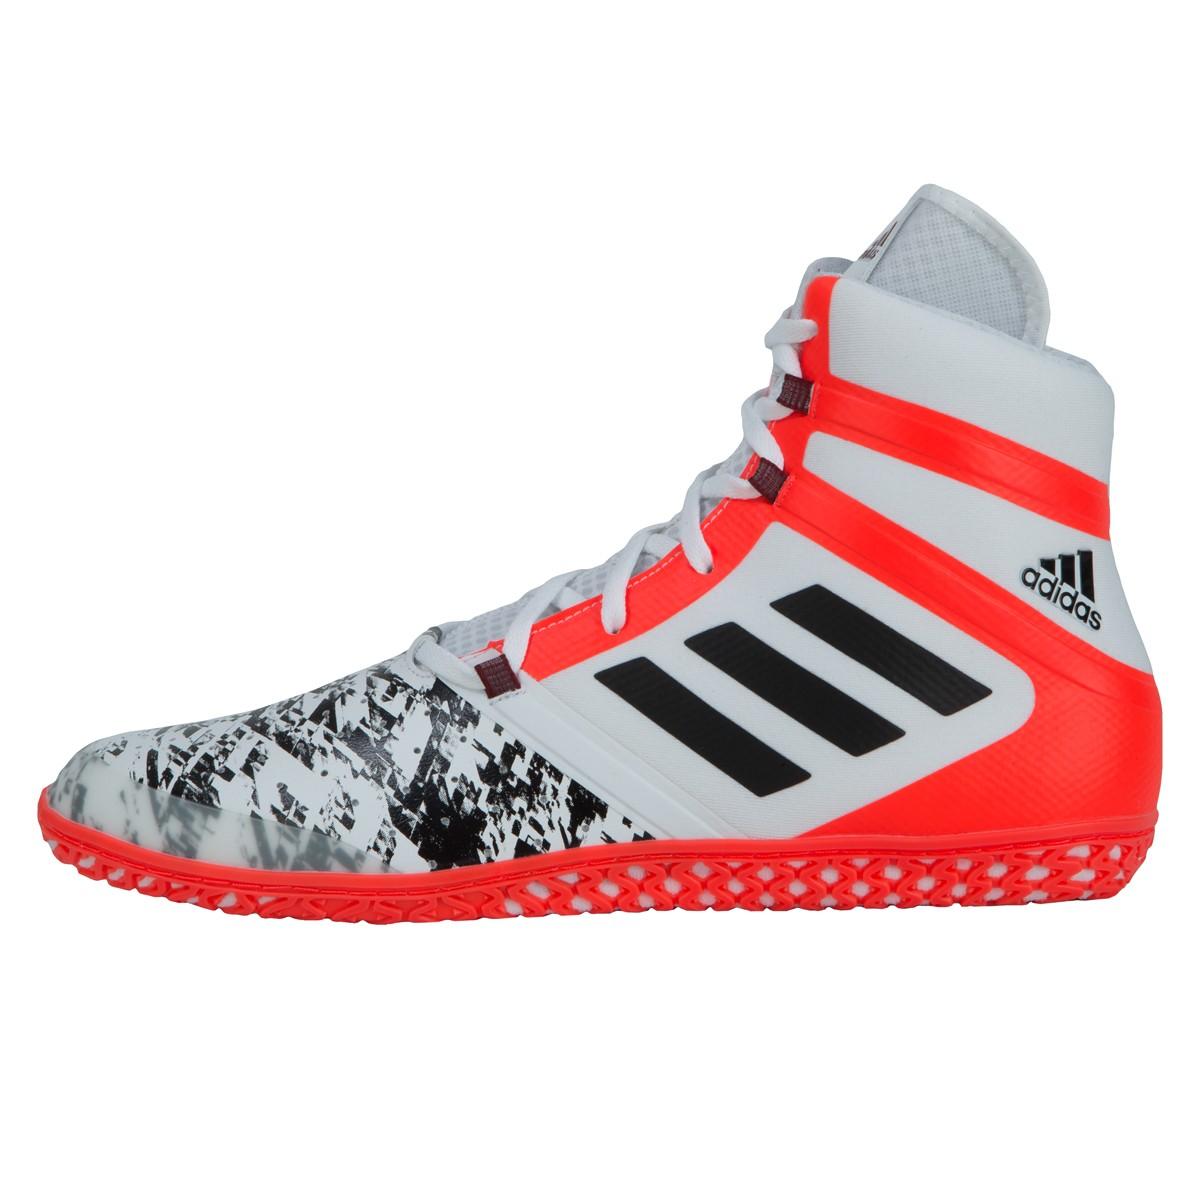 adidas boxing shoes adidas ring shoes HBHNSWQ